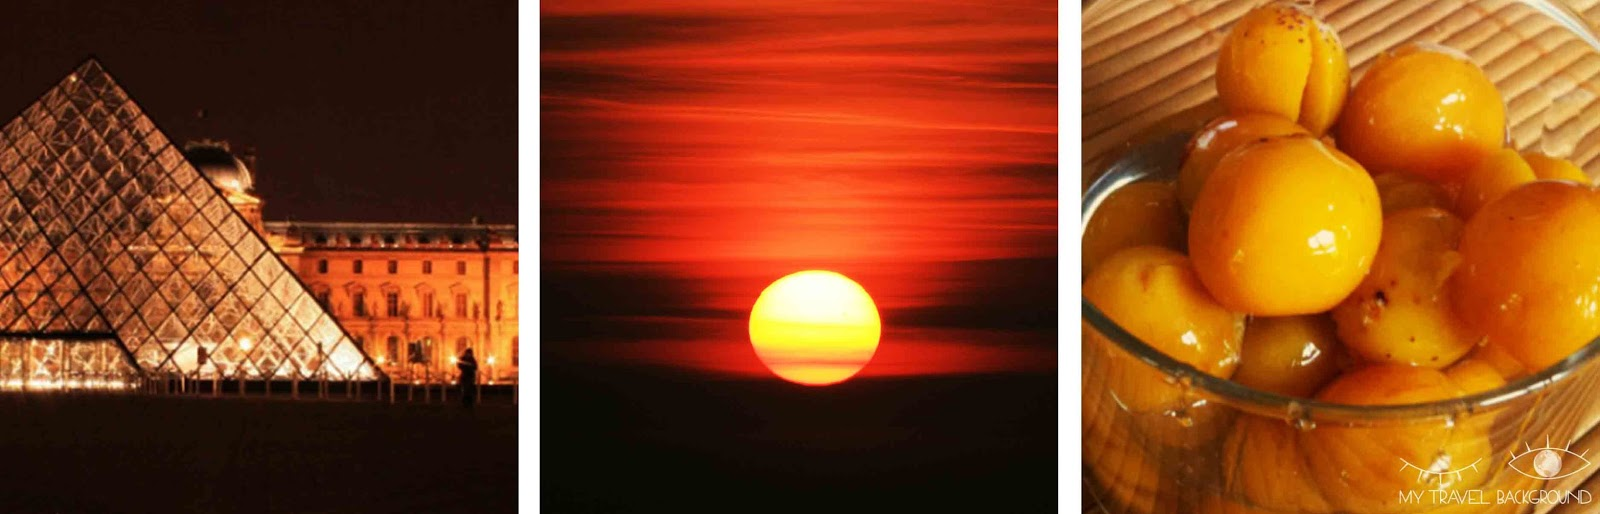 My Travel Background : La Terre, ce formidable arc-en-ciel ! Orange